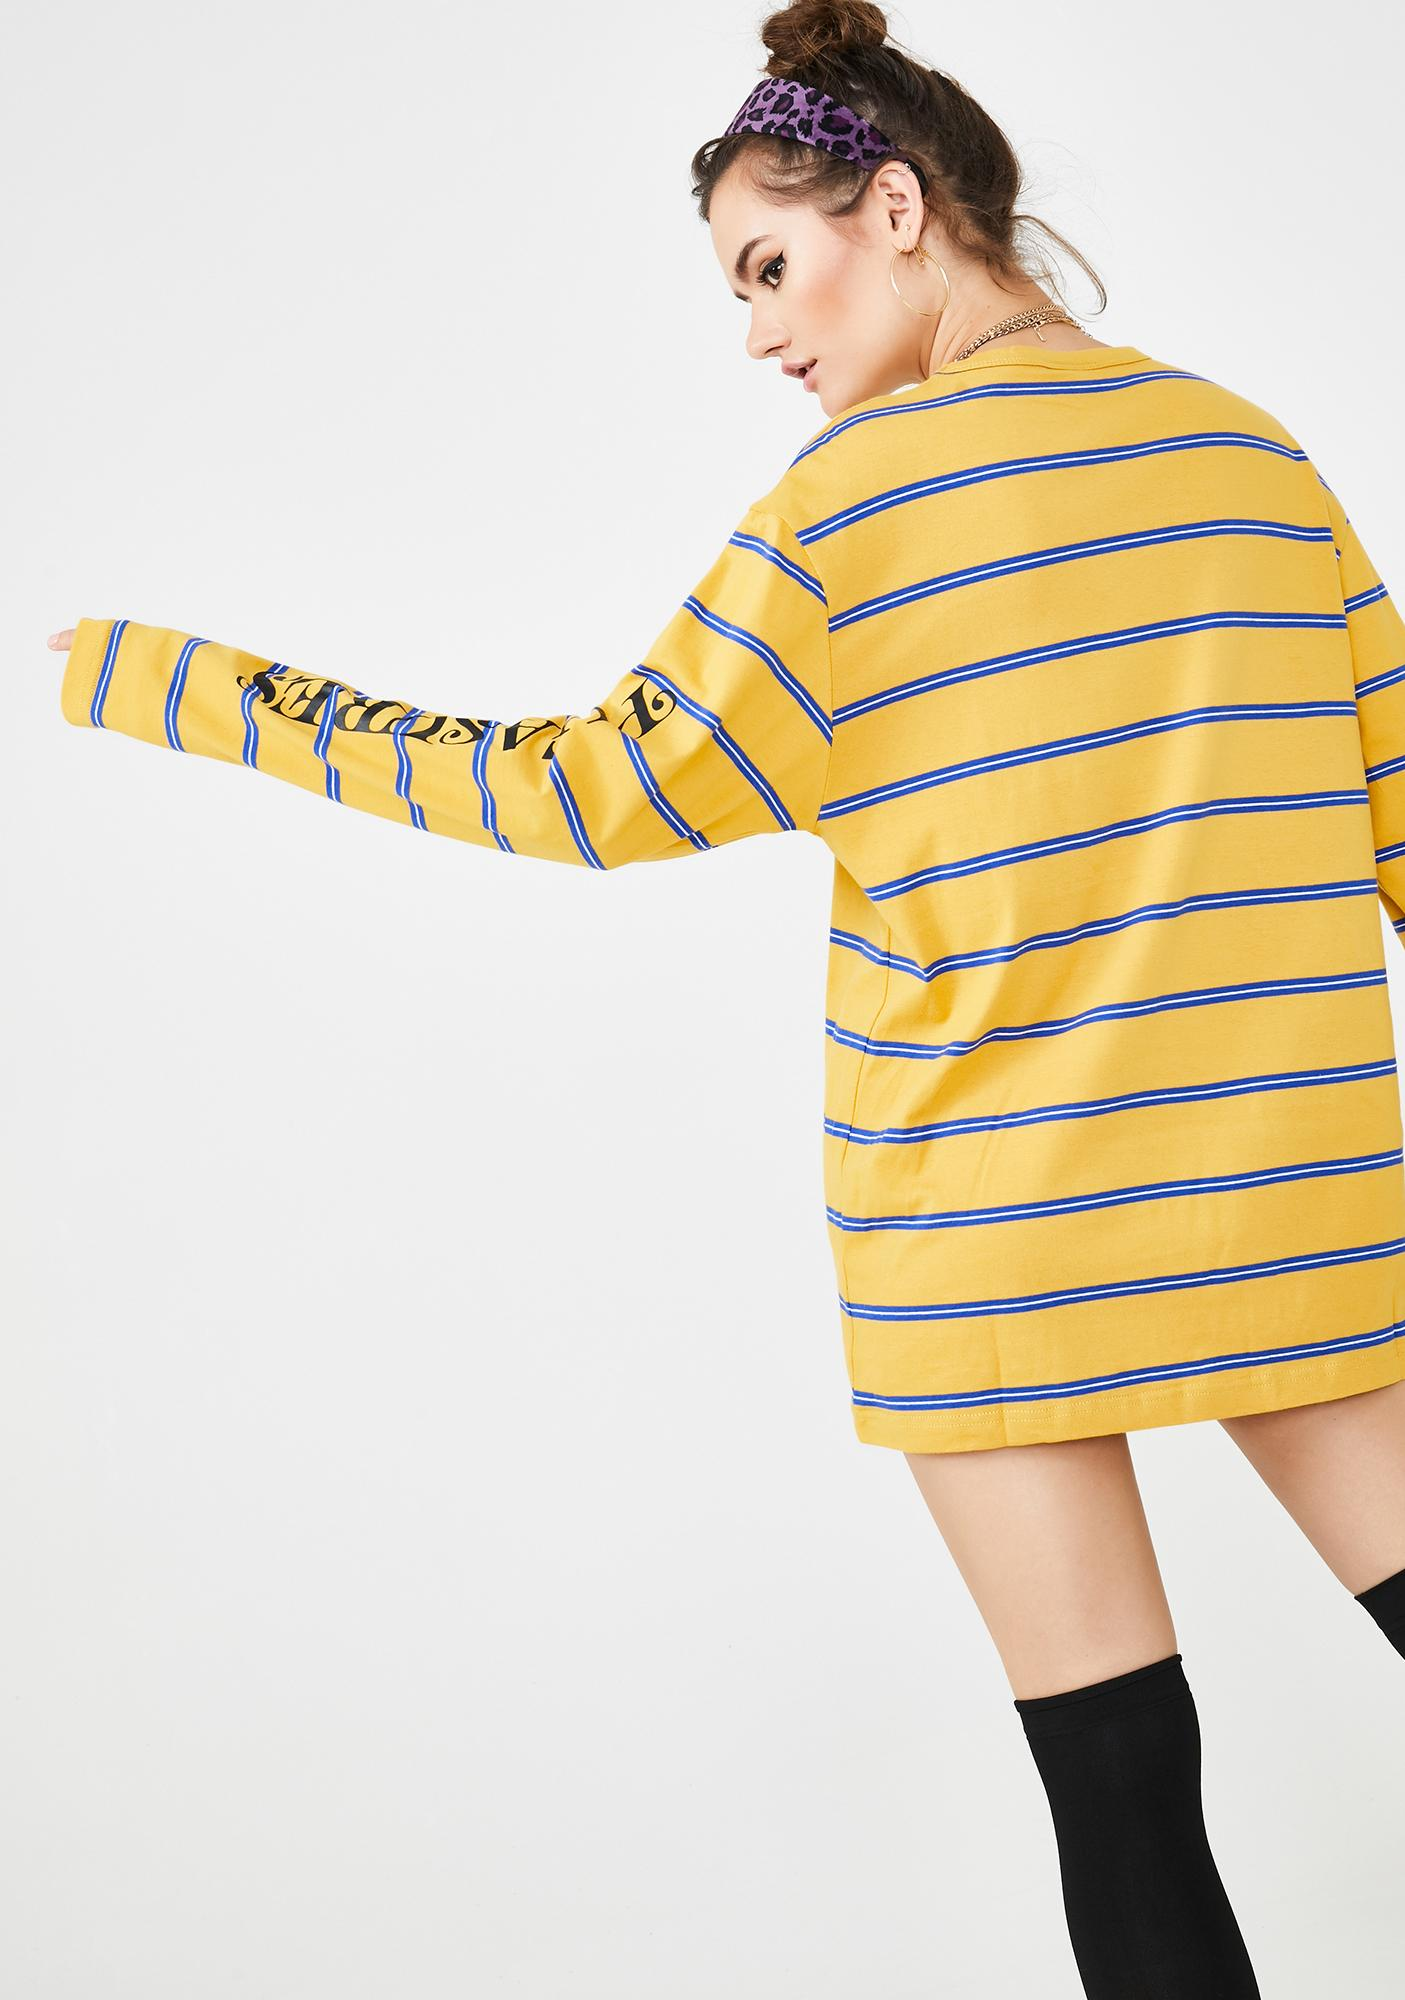 Pleasures Sour Scream Striped Long Sleeve Shirt